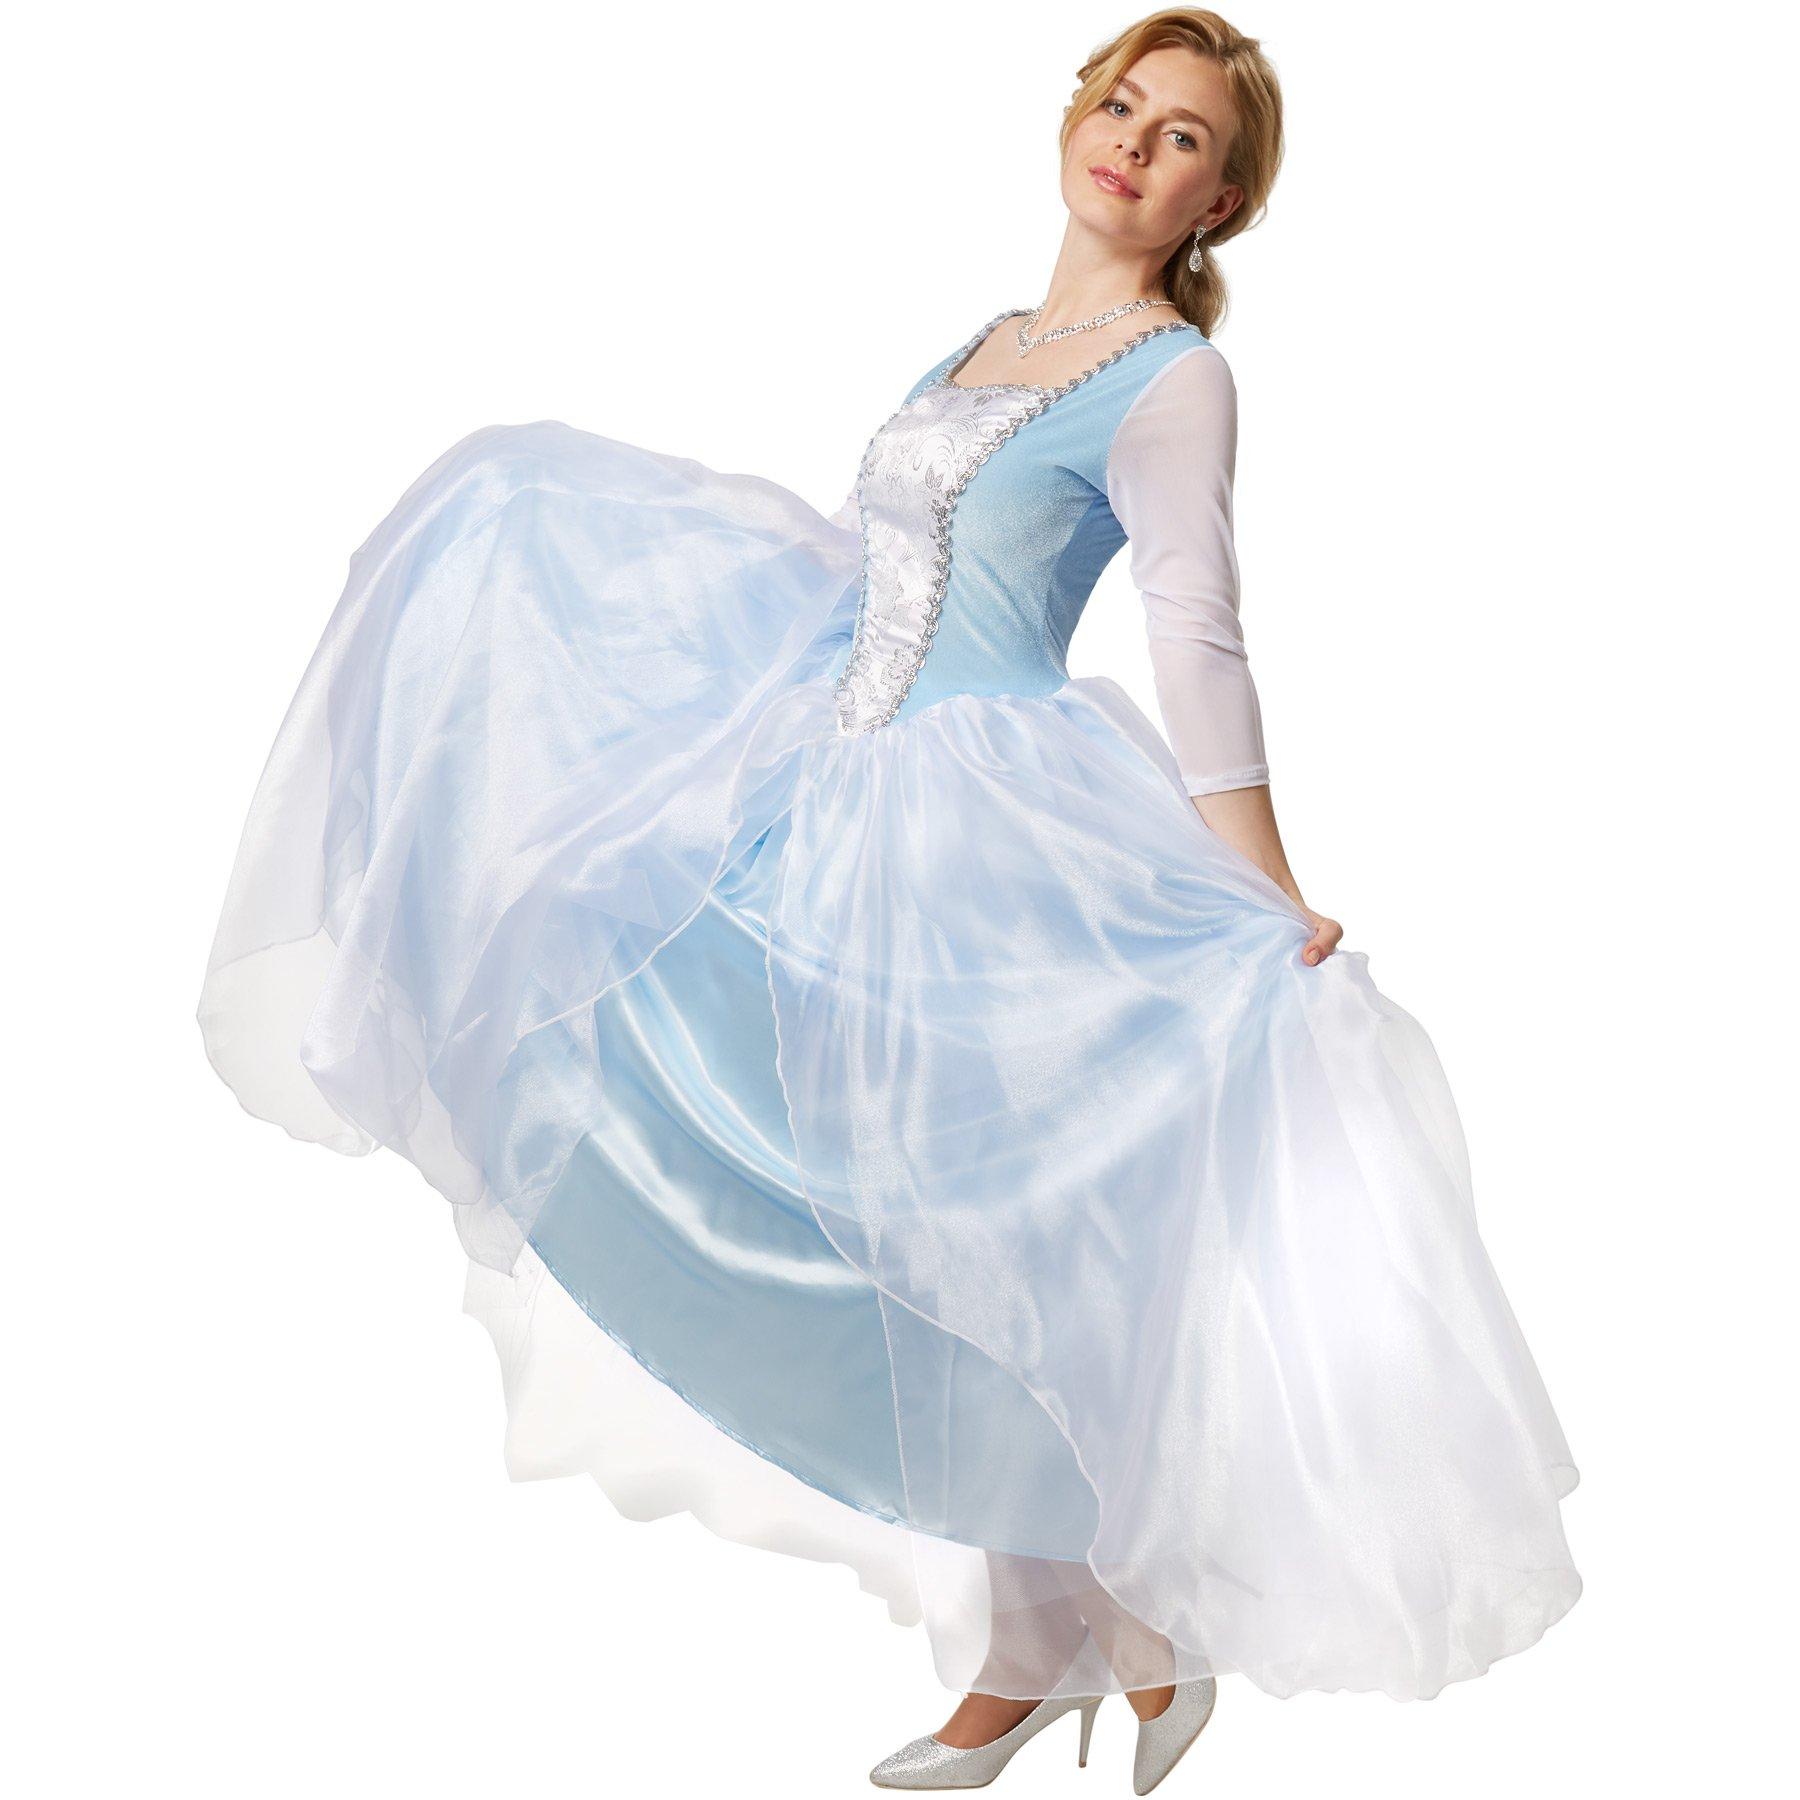 3b30487ca4 dressforfun Exquisite Cinderella Princess Dress